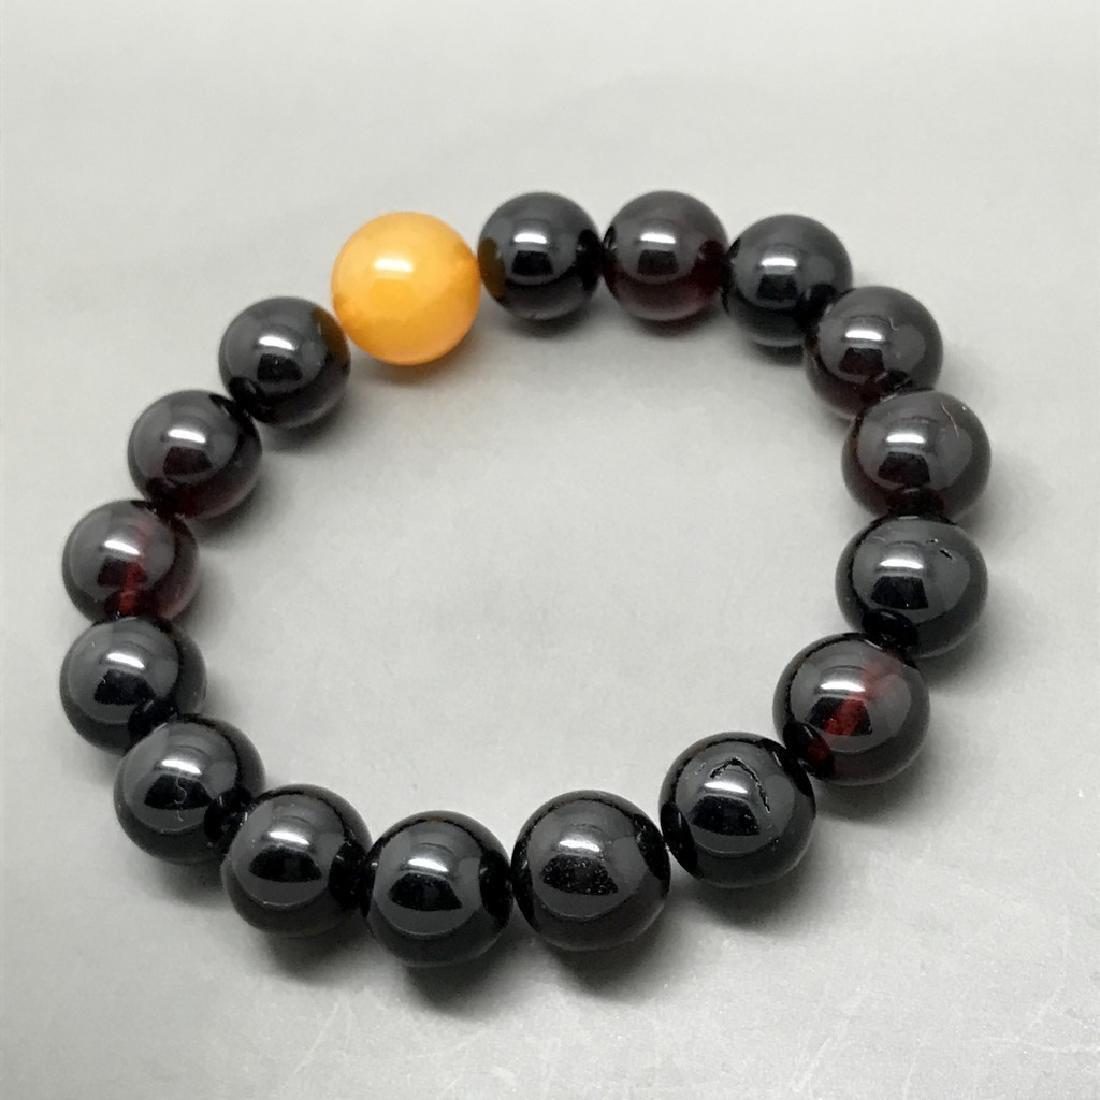 Bracelet vintage Baltic amber cherry&butterscotch beads - 5